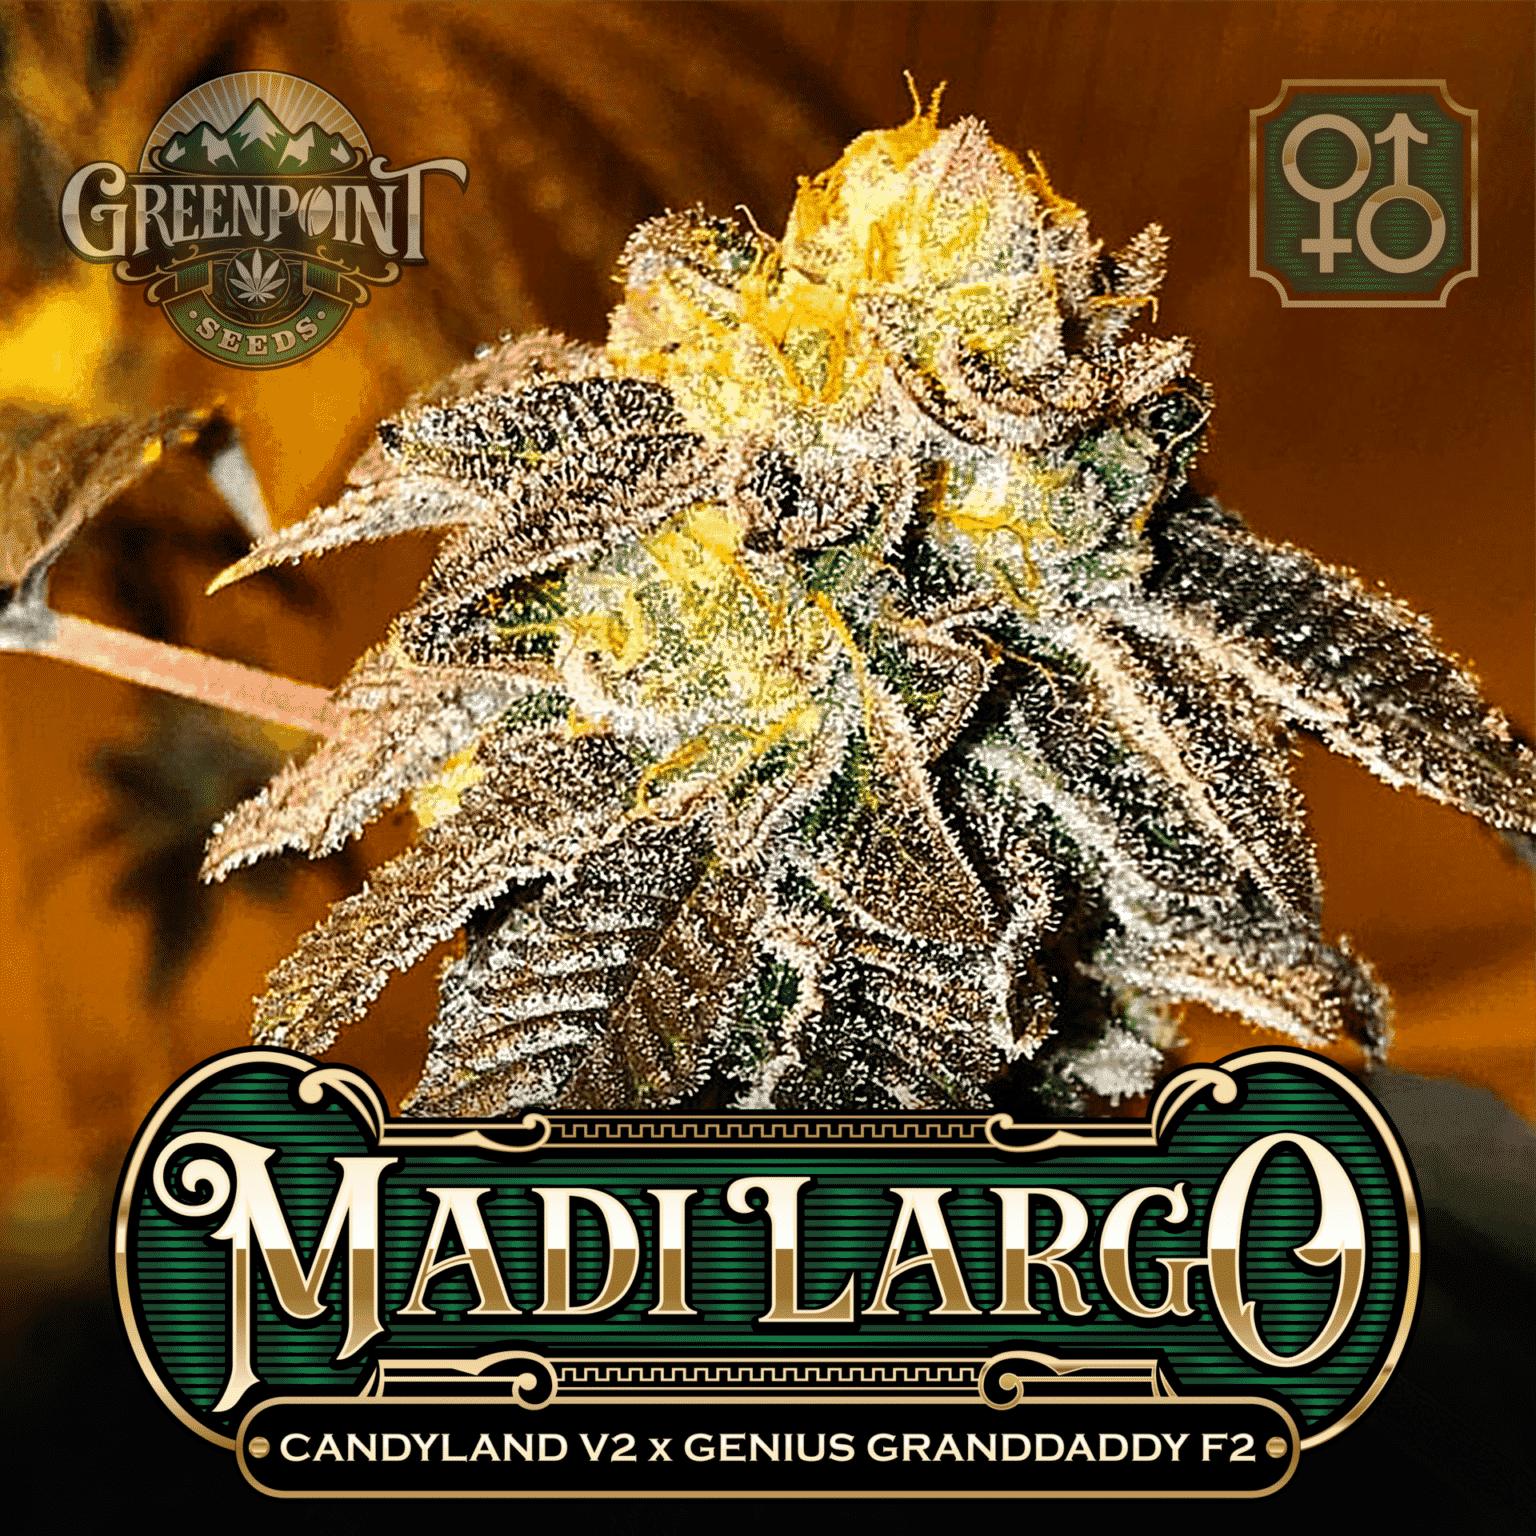 Candyland v2 x Genius Granddaddy F2 Seeds - Madi Largo Cannabis Seeds - US Seed Bank